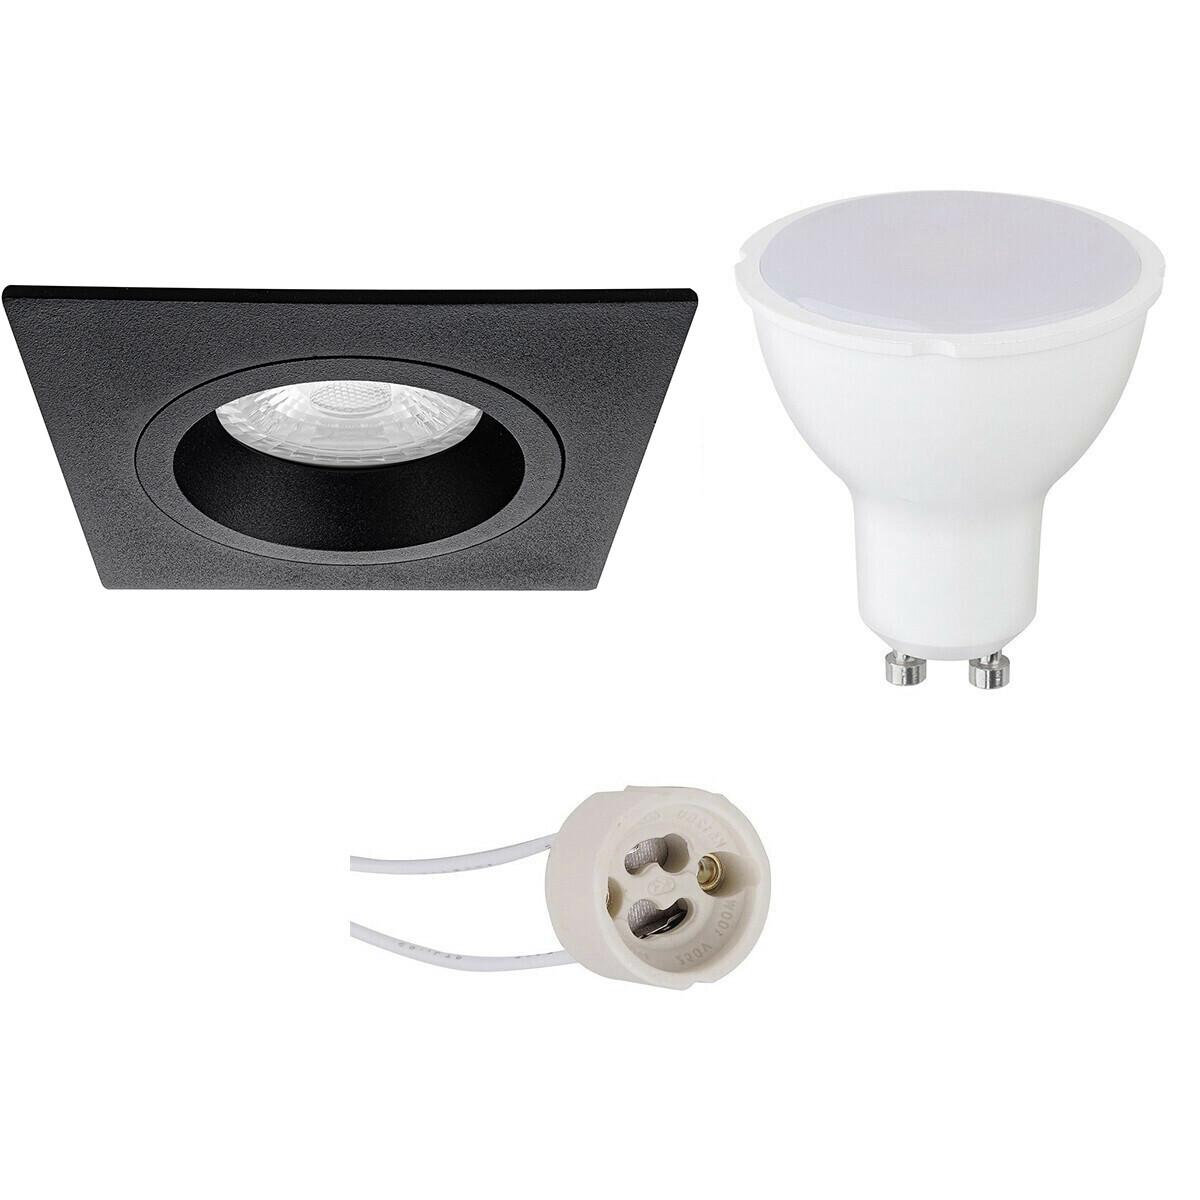 LED Spot Set - Pragmi Rodos Pro - GU10 Fitting - Inbouw Vierkant - Mat Zwart - 8W - Natuurlijk Wit 4